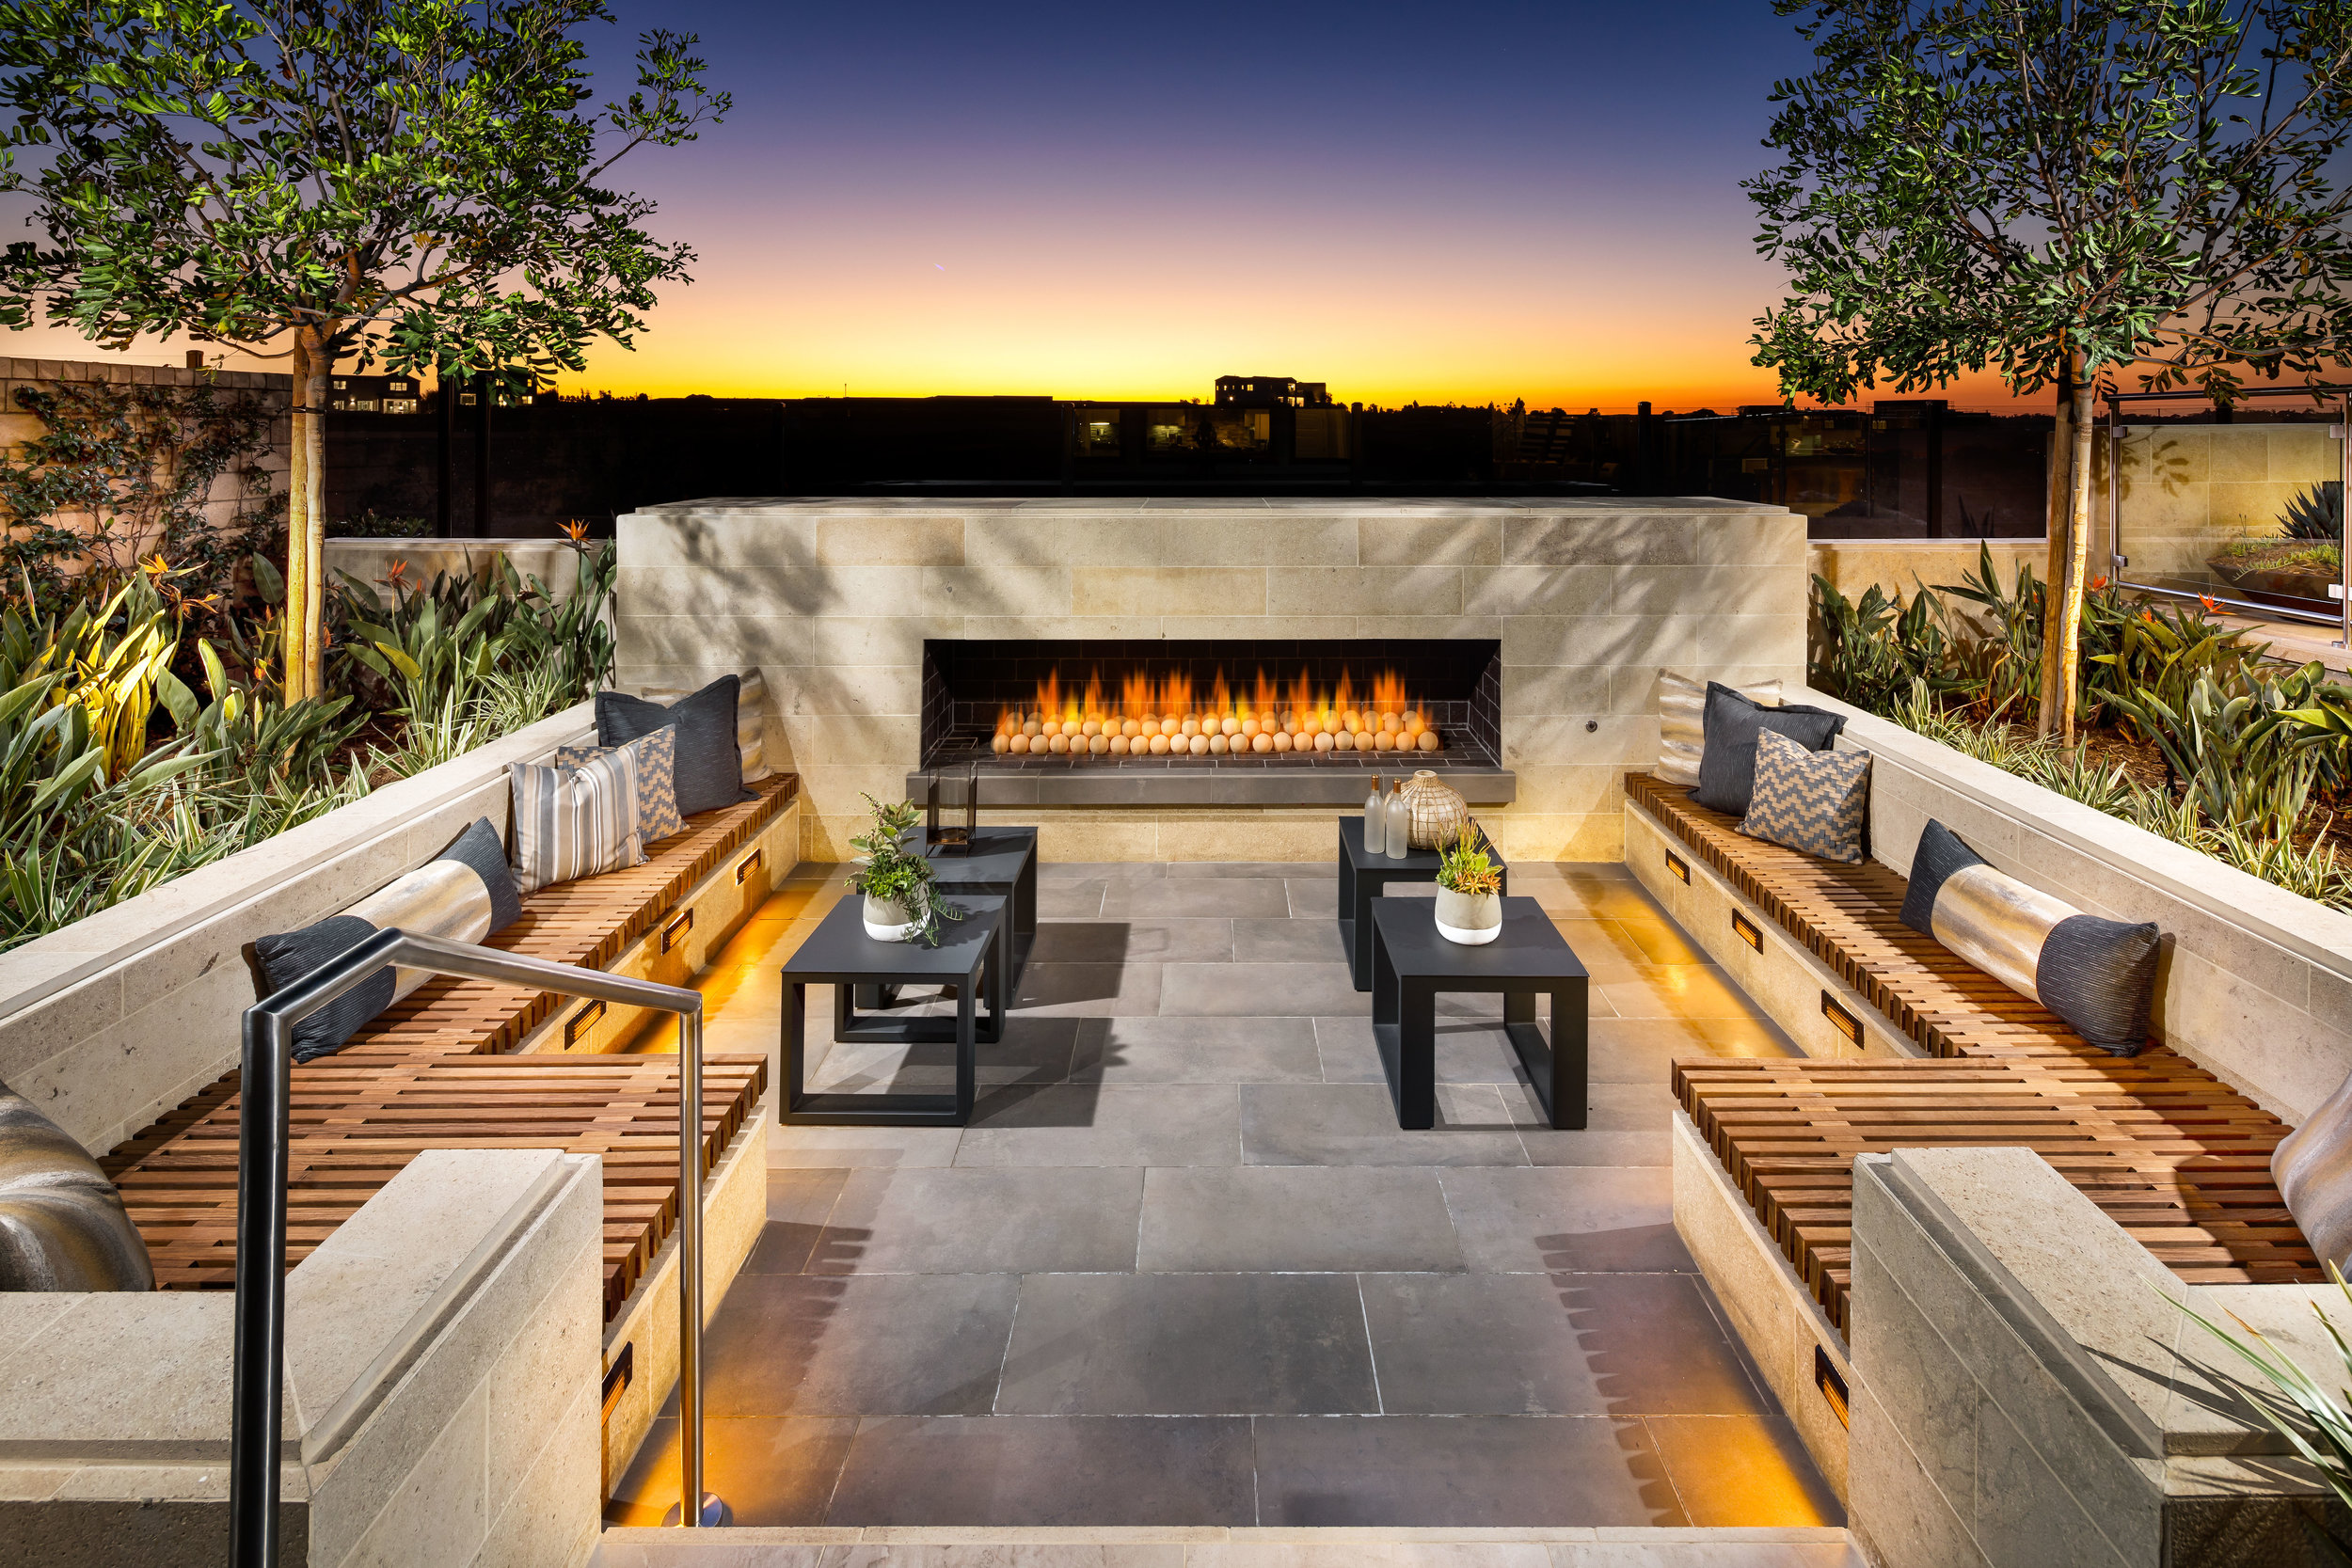 36-Palomar-Savenza_Sunken Fire Pit a.jpg